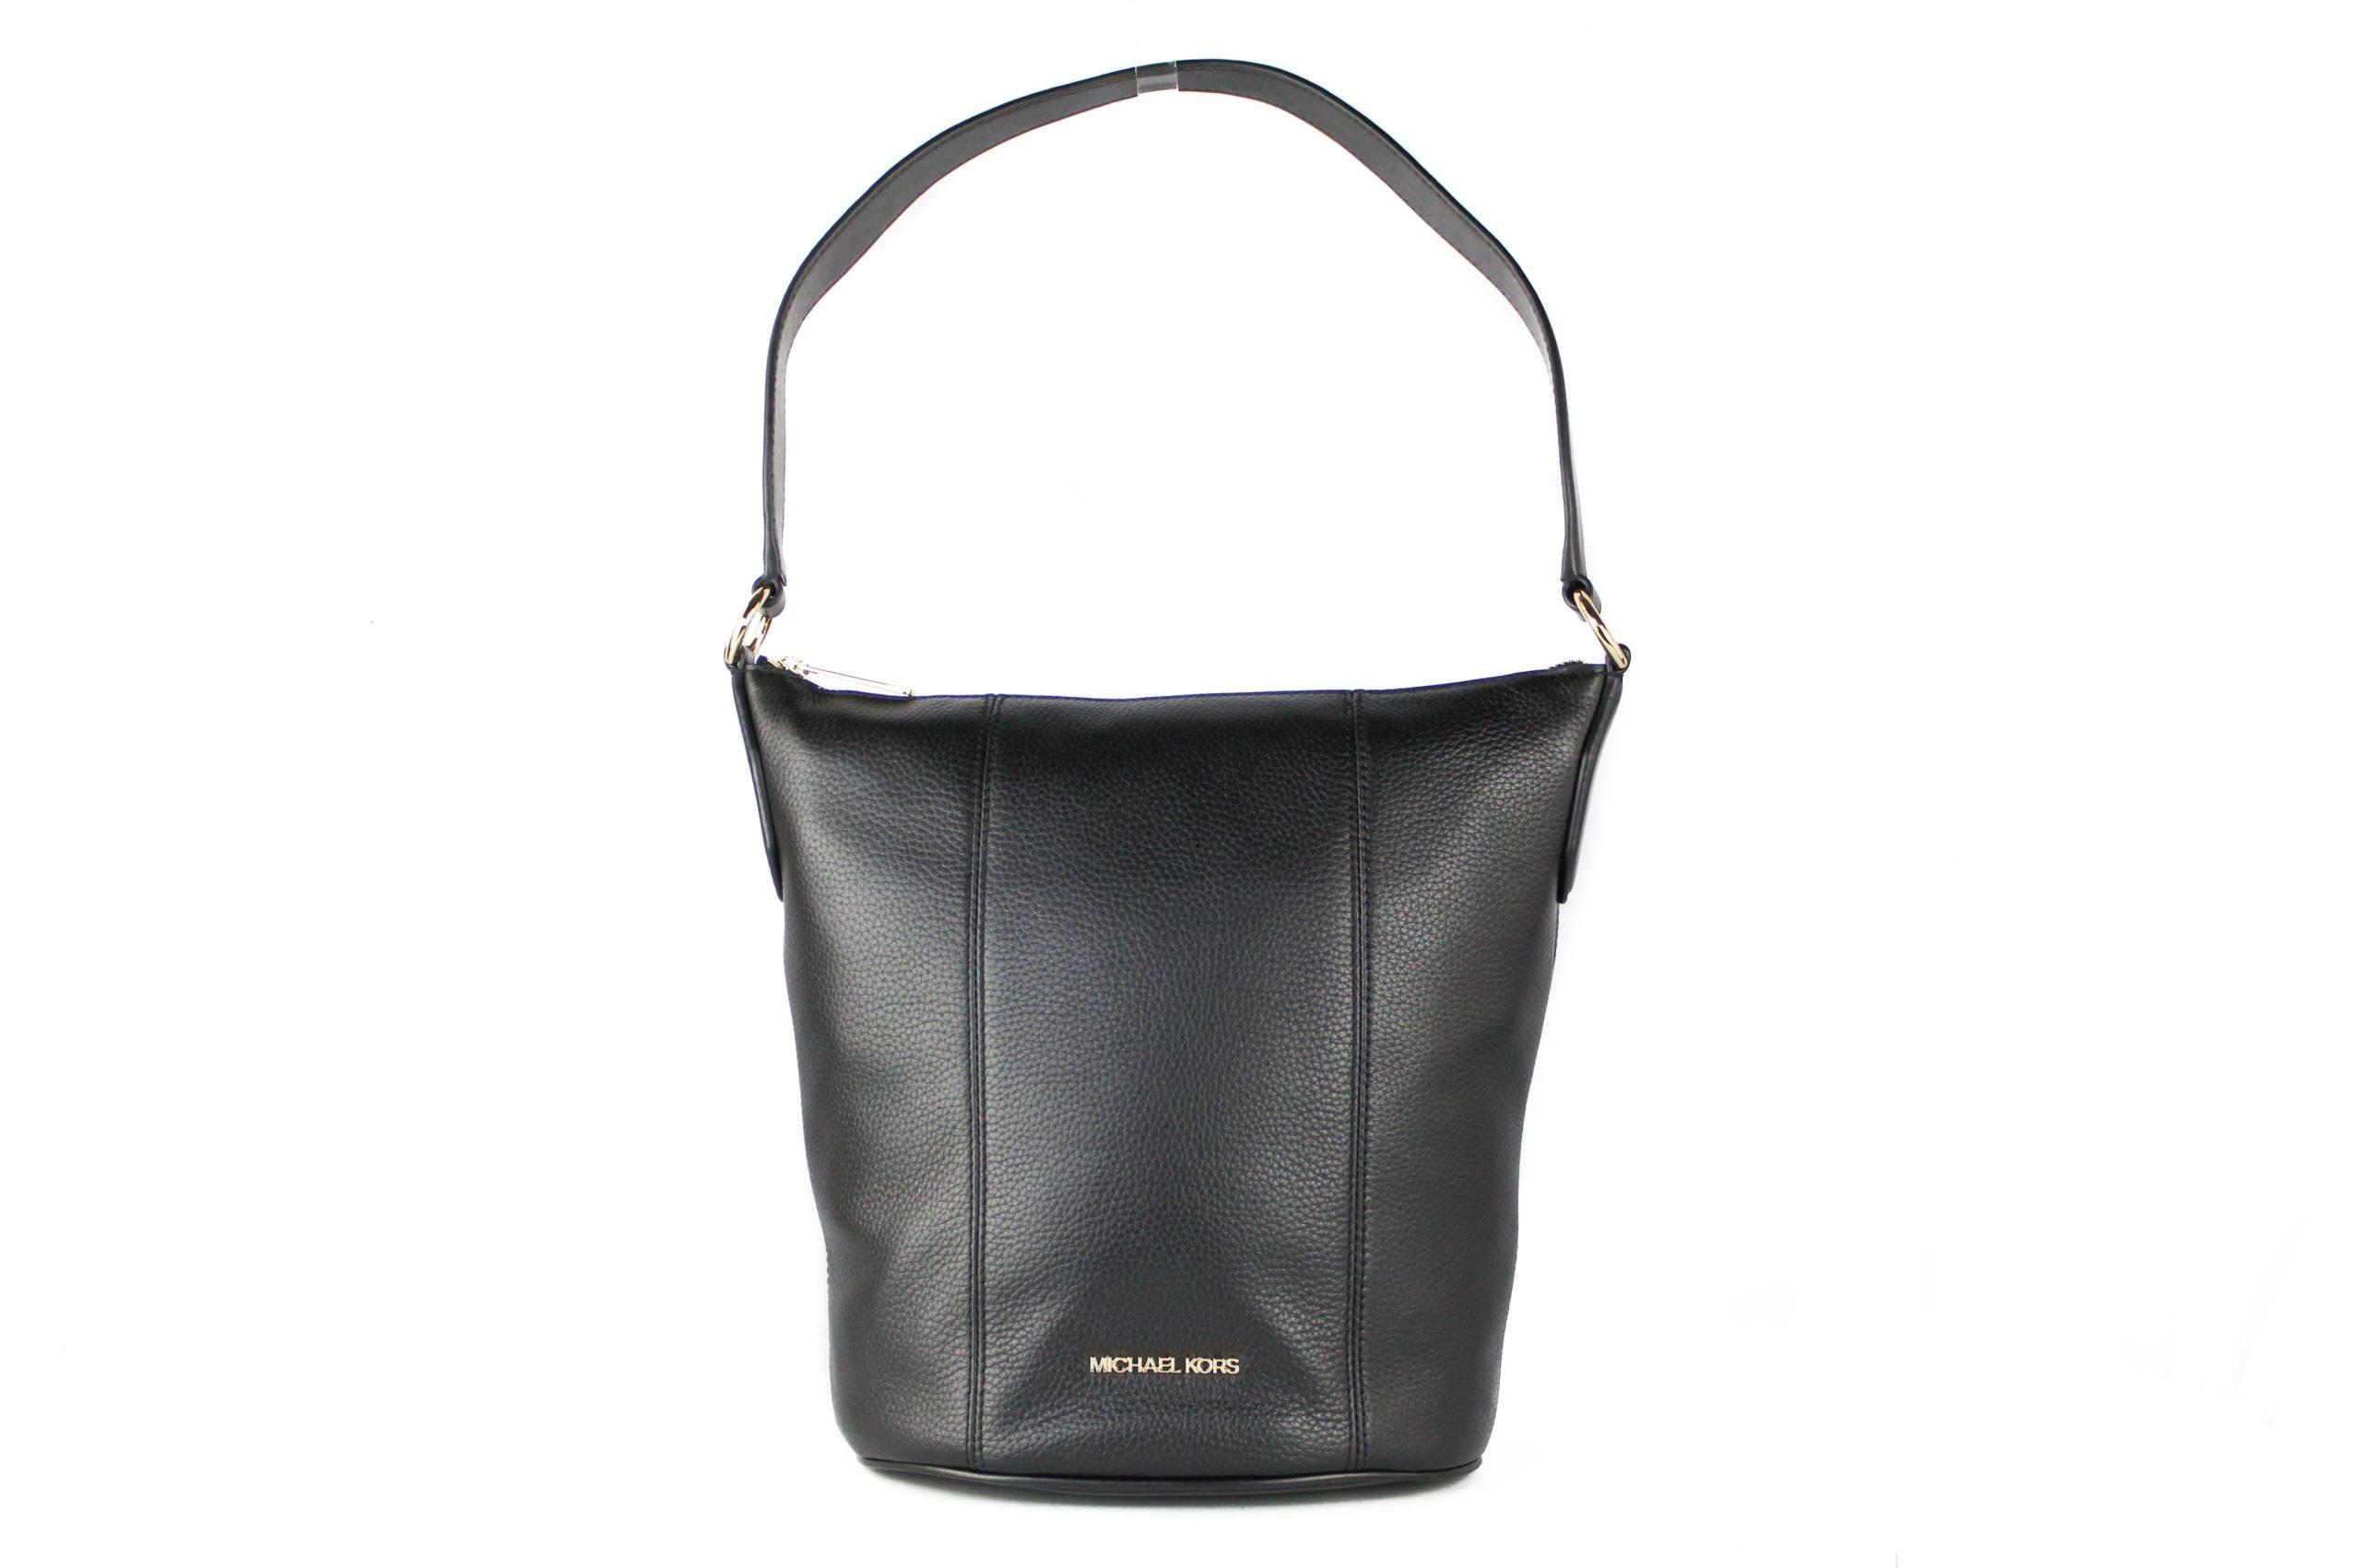 Michael Kors Women's Brooke Bucket Bag Black 22368